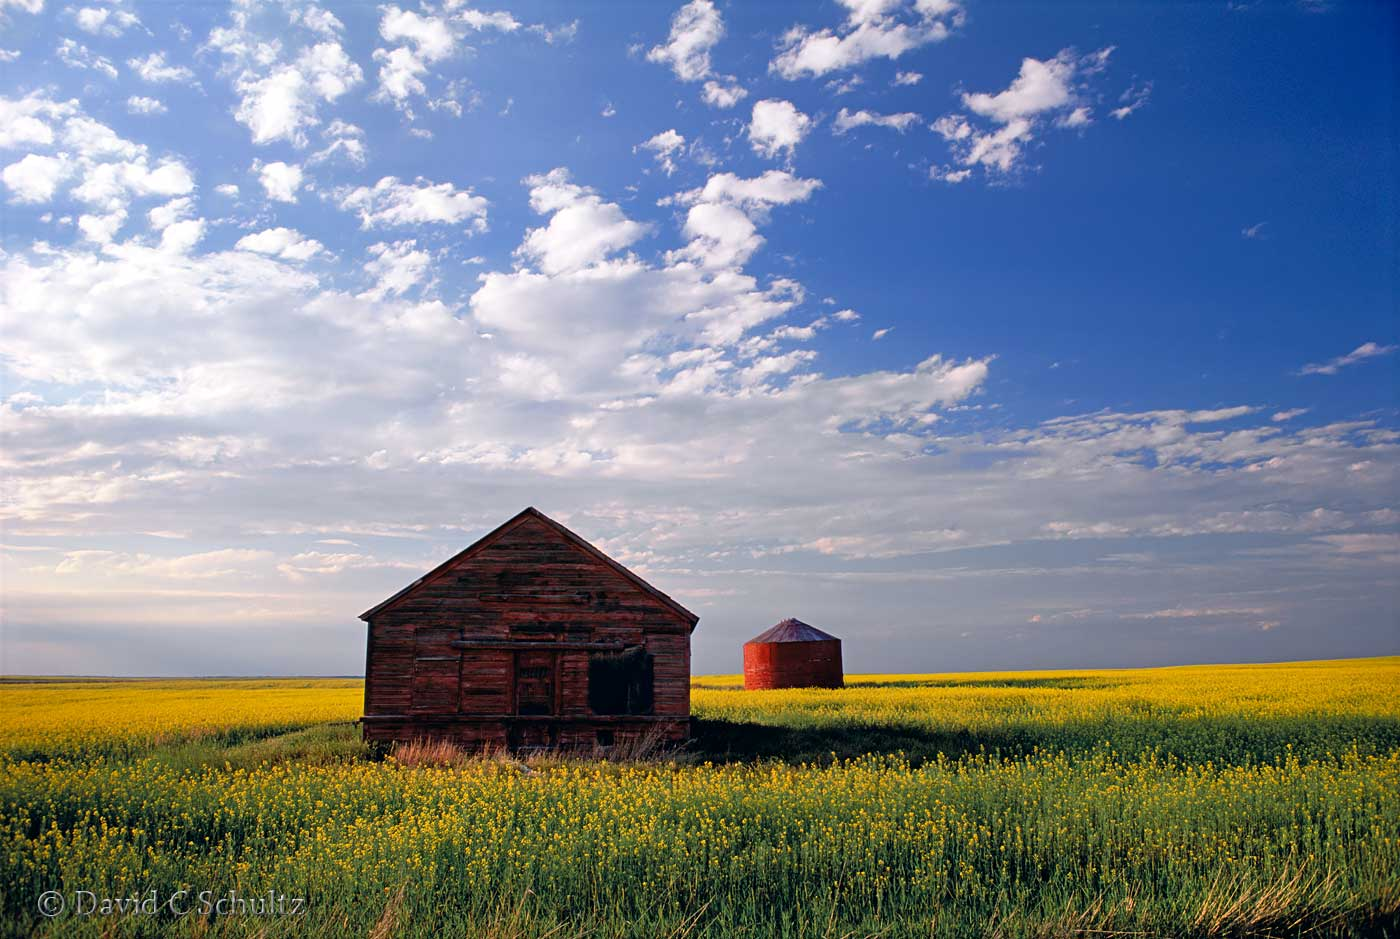 cCanola field in bloom in Alberta, Canada - Image #7-1245